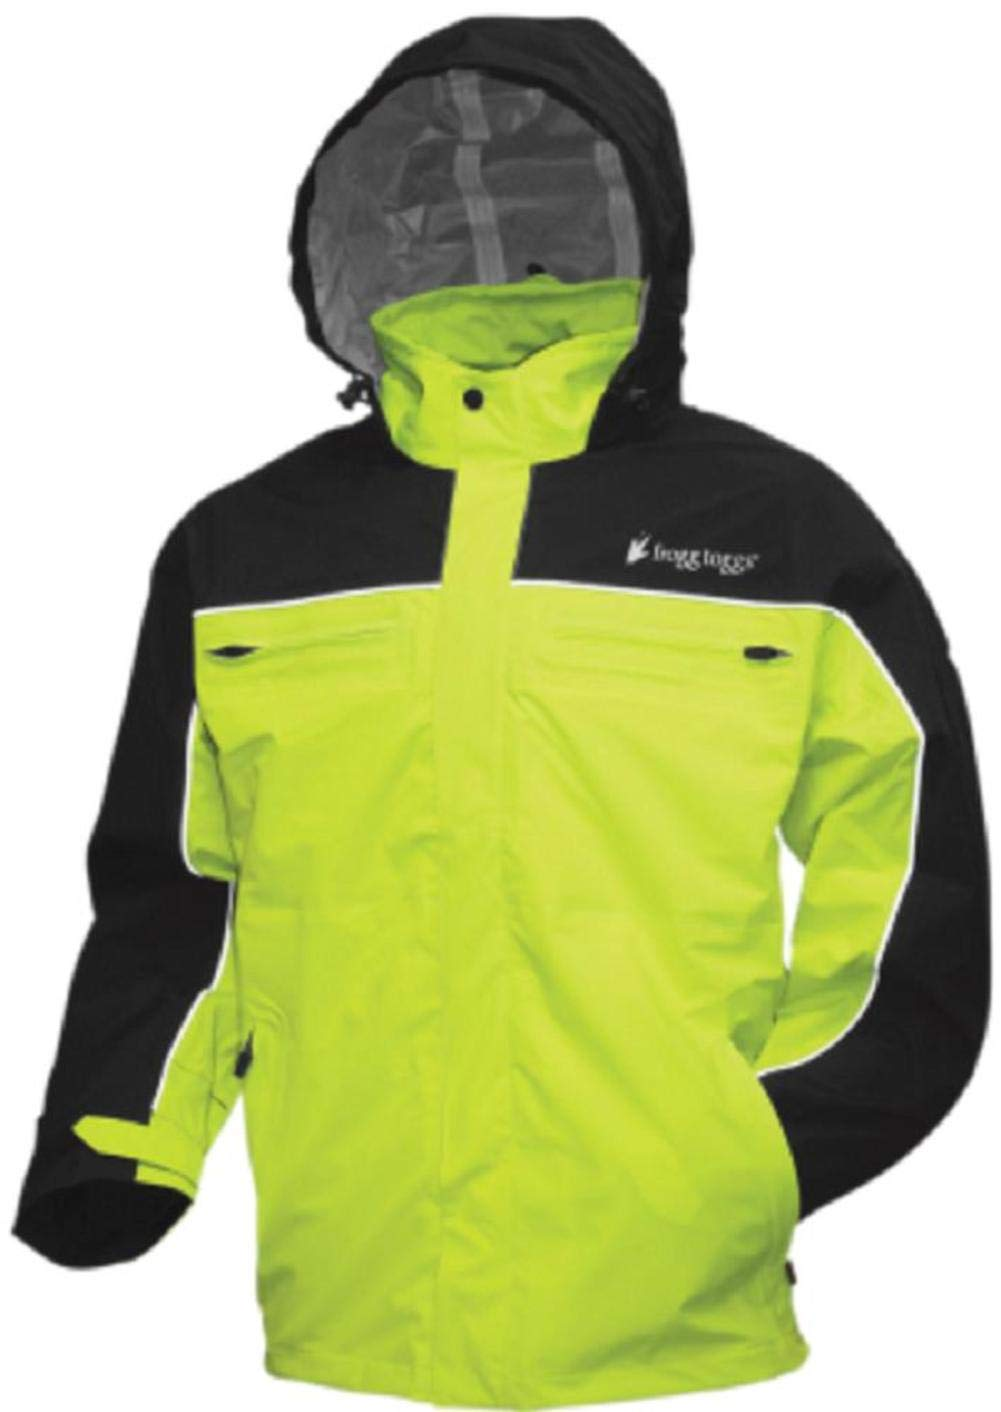 Frogg Toggs Men's Pilot Cruiser Jacket Sportsman Supply Inc.